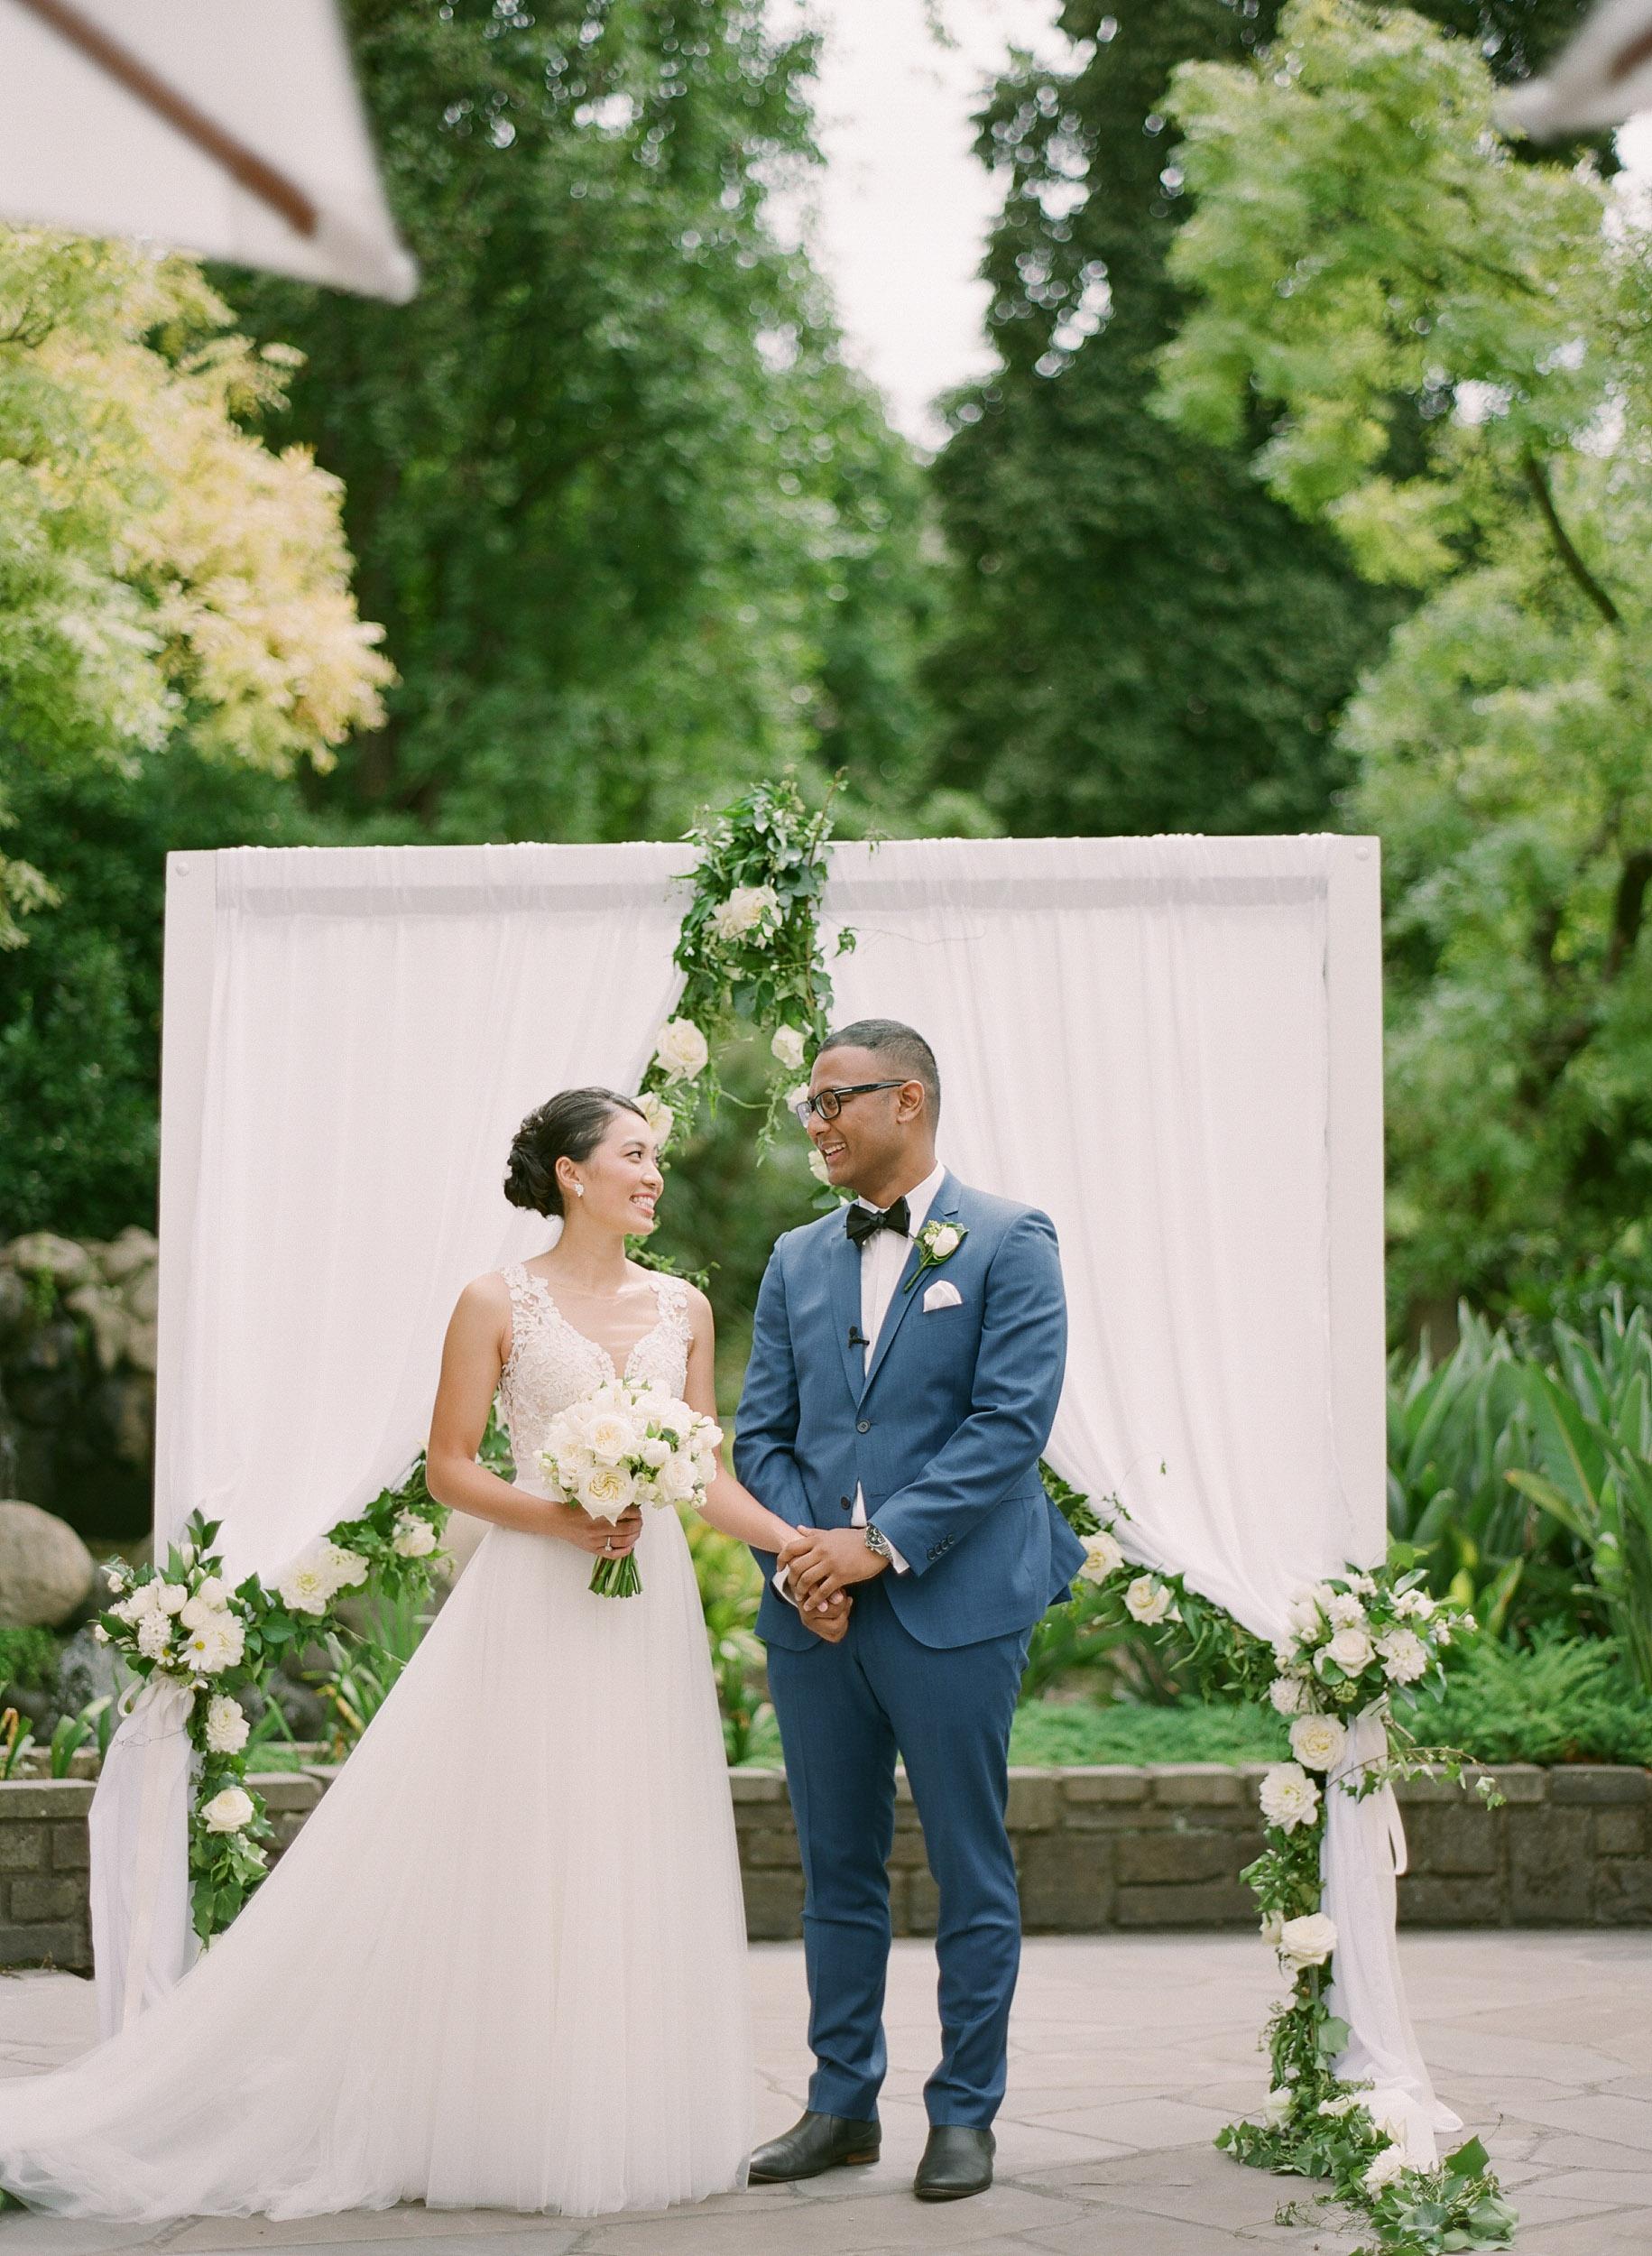 Wedding (1 of 1) - 000086720013.jpg